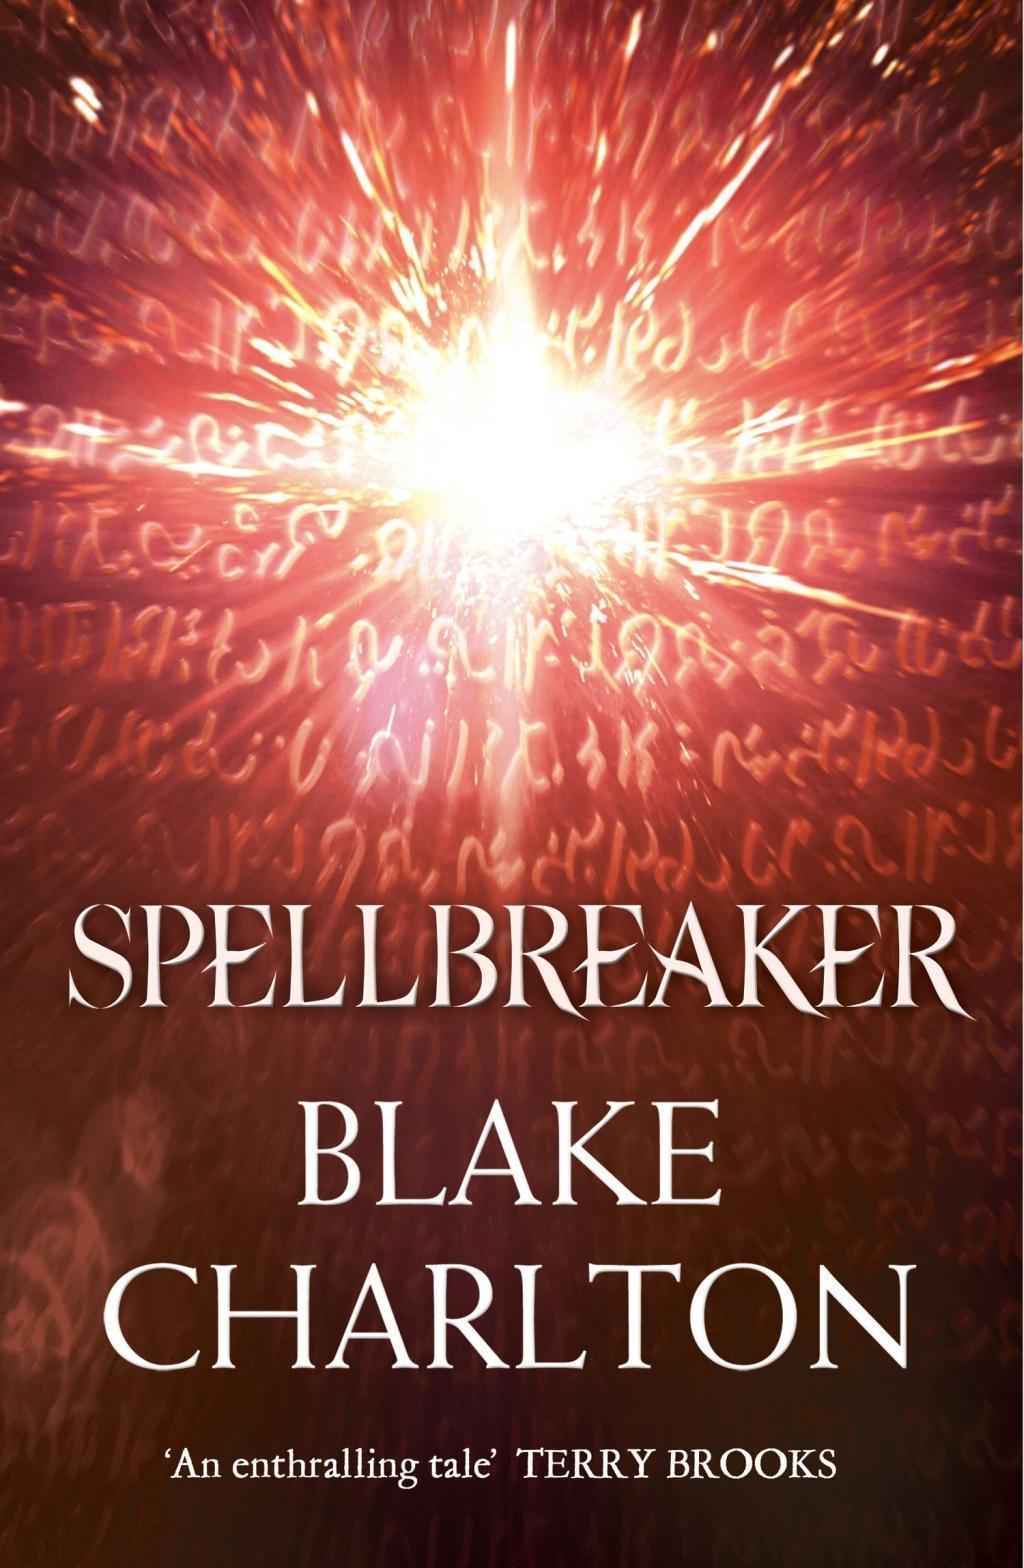 Spellbreaker: Book 3 of the Spellwright Trilogy (The Spellwright Trilogy, Book 3)